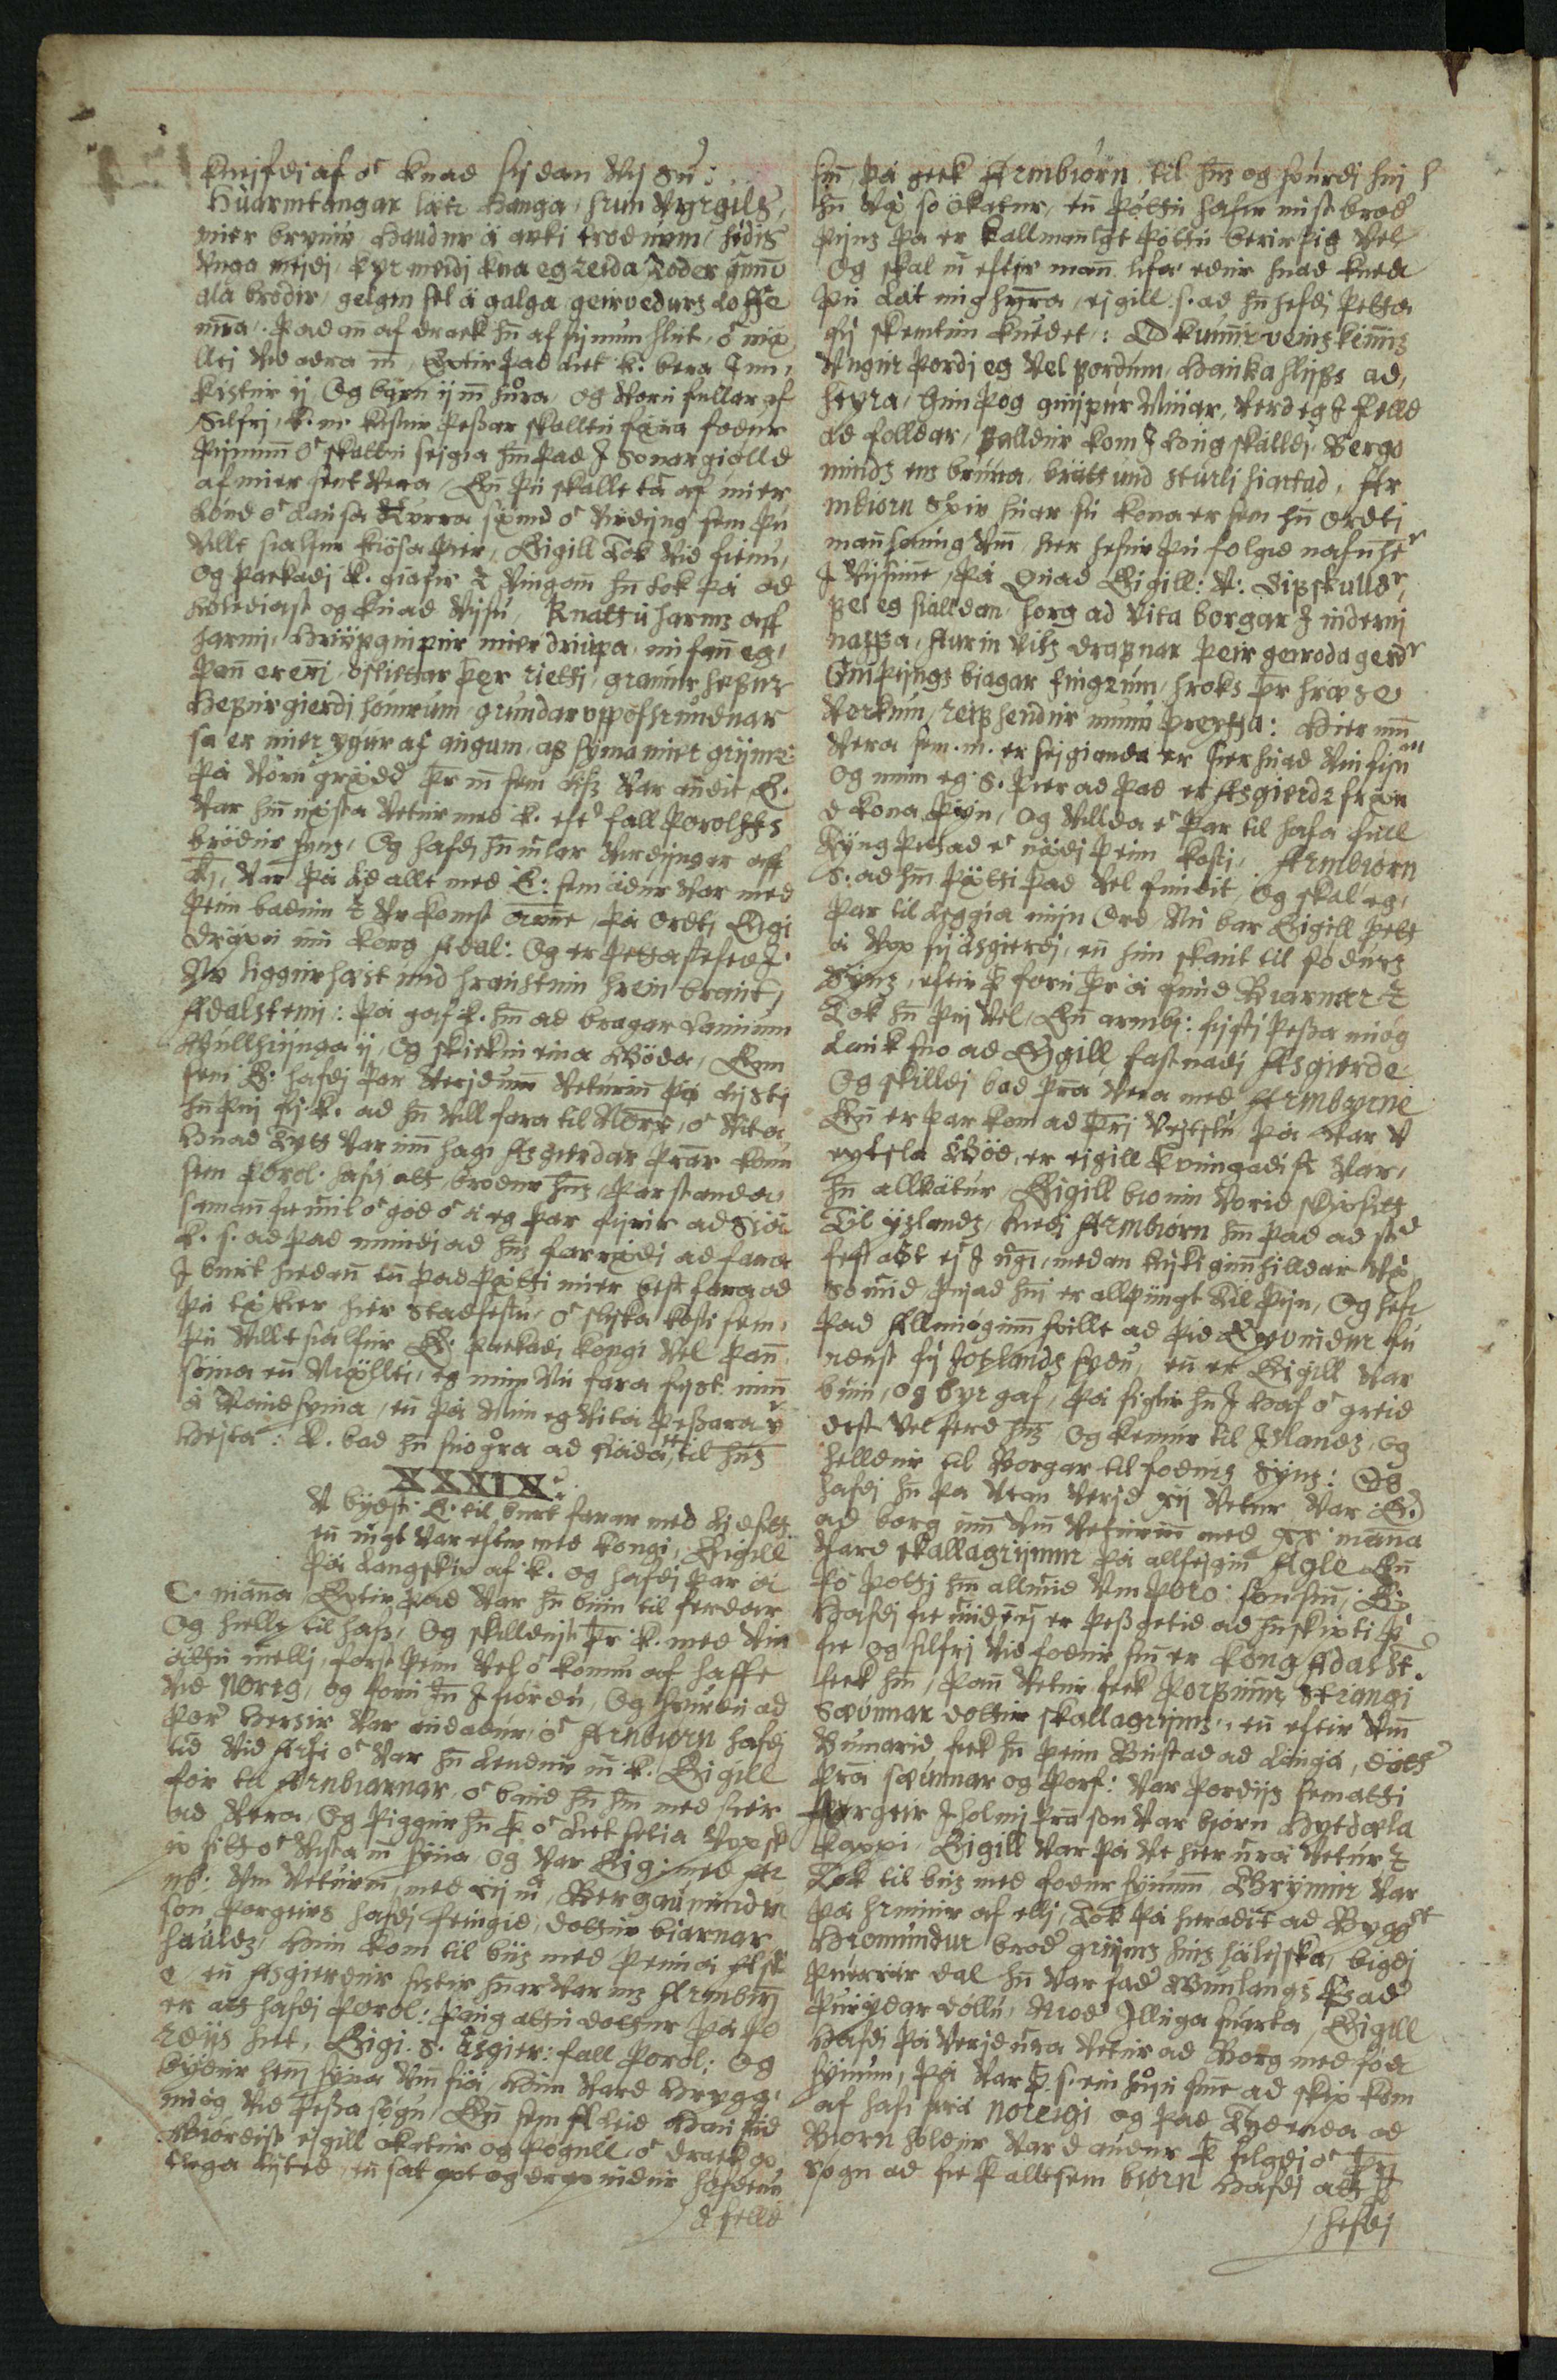 AM 158 fol - 81v